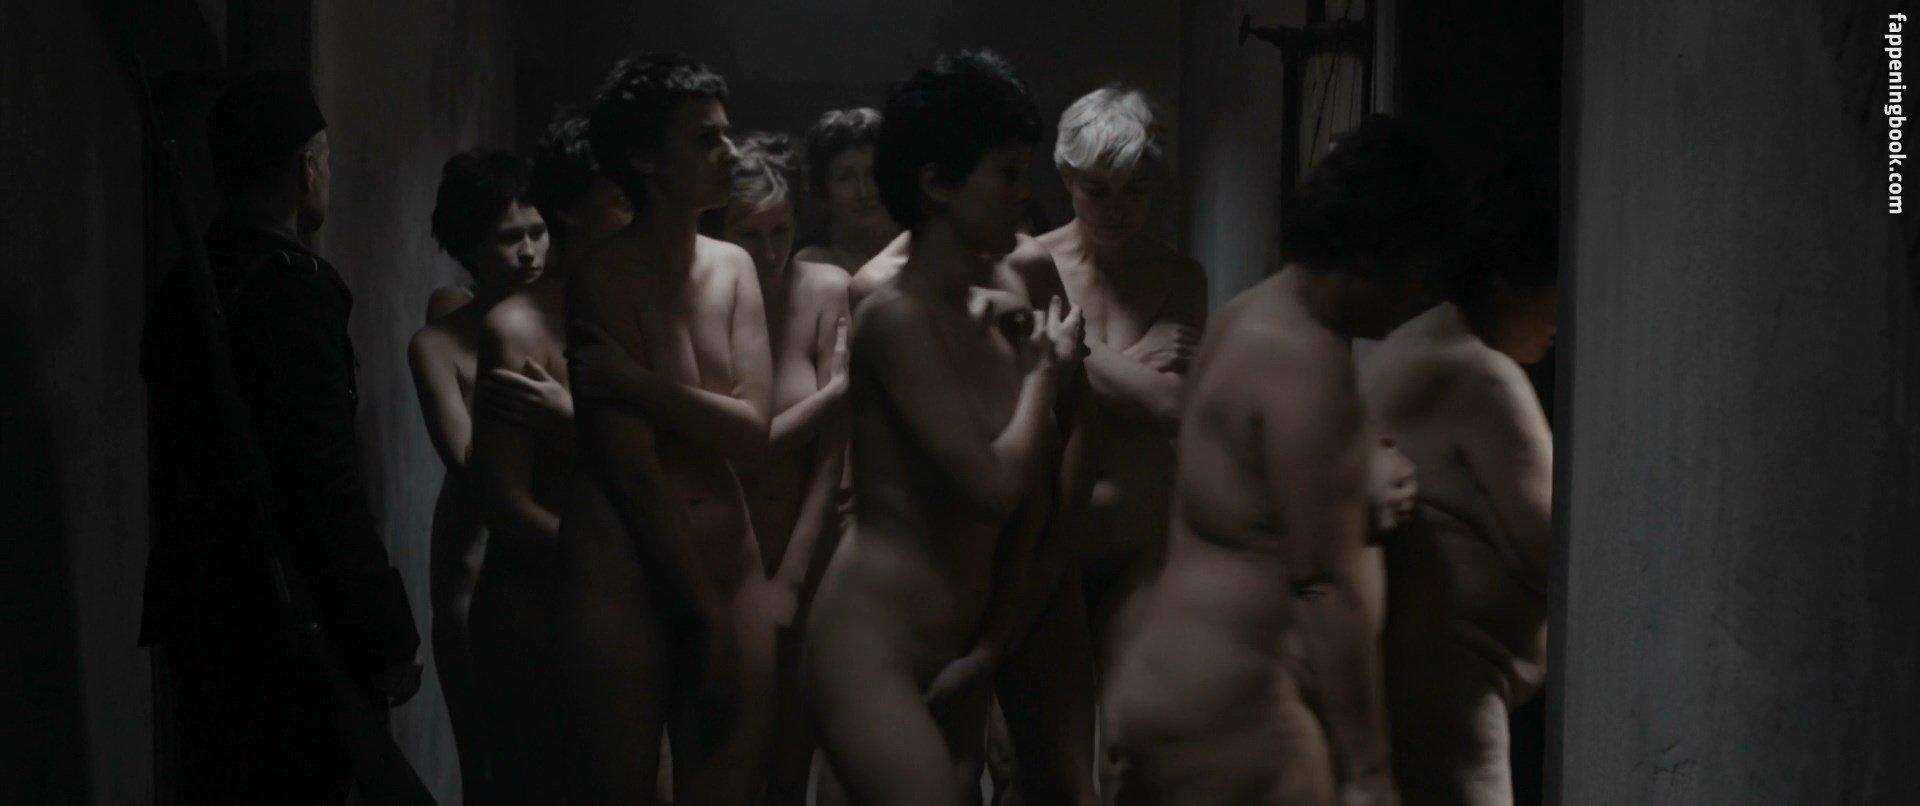 Ana Maljevic Nude michalina olszańska nude, sexy, the fappening, uncensored